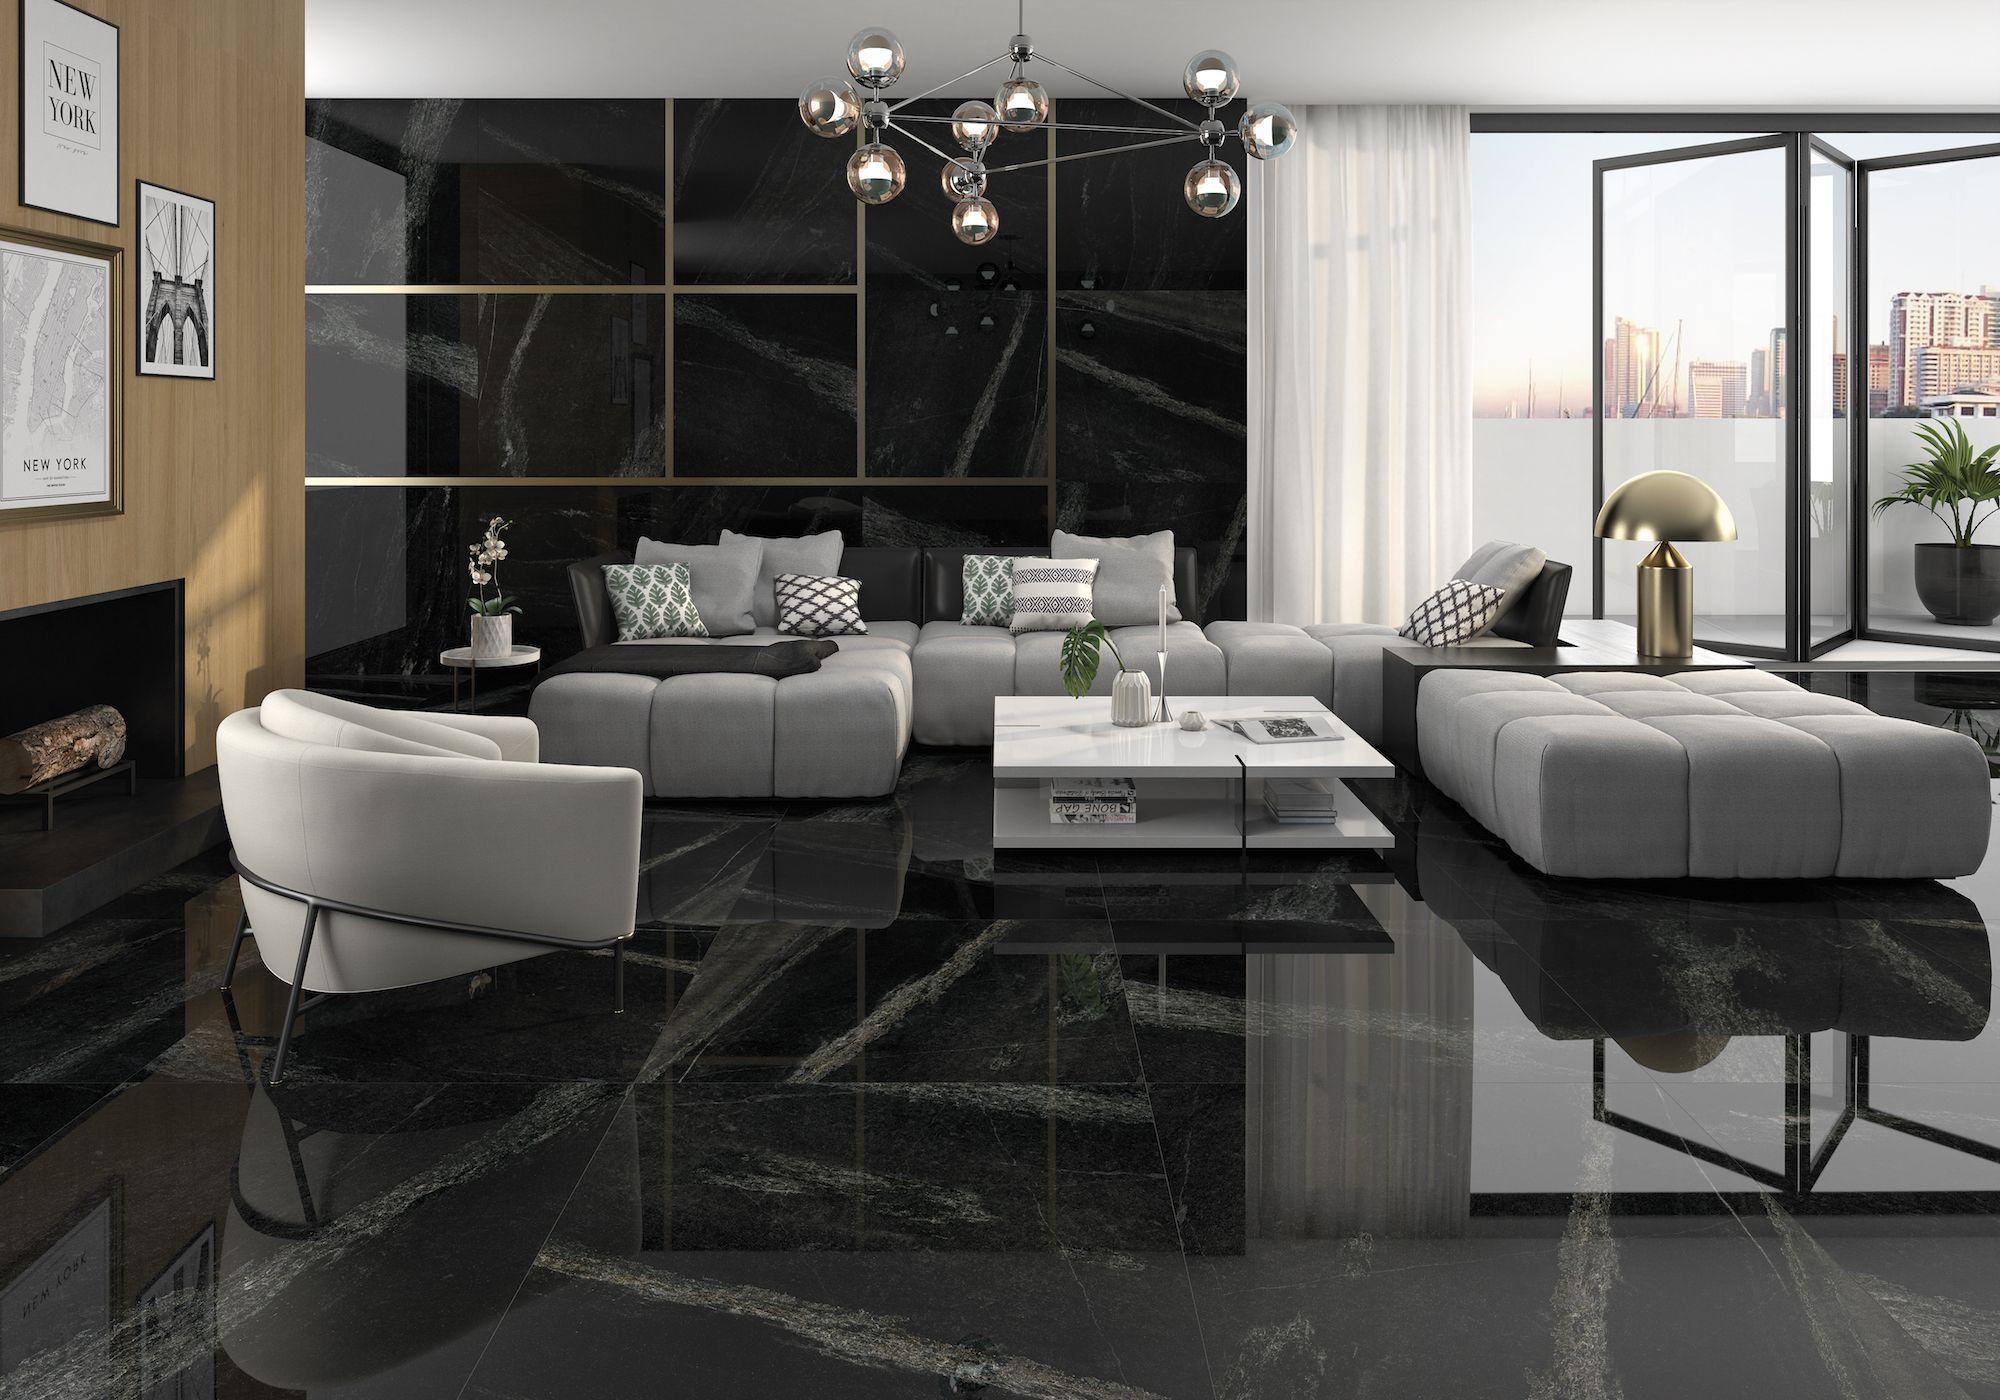 Product Selector Ceramic Floor Tiles Https Archello Com